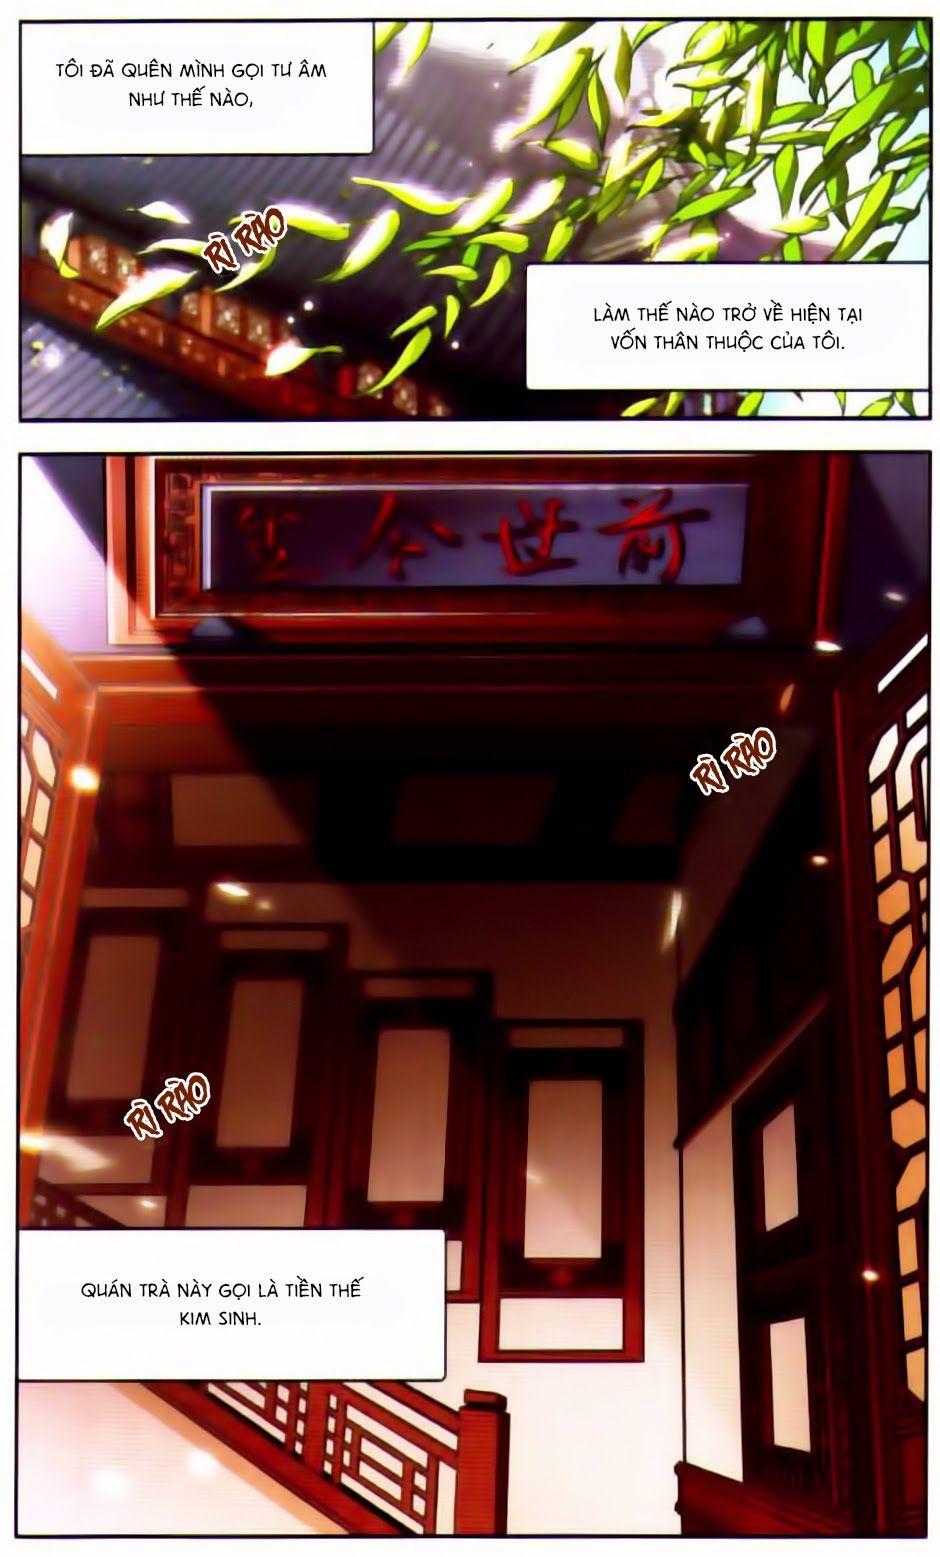 meiepanus.com tam trao tien the chi lu chap 46